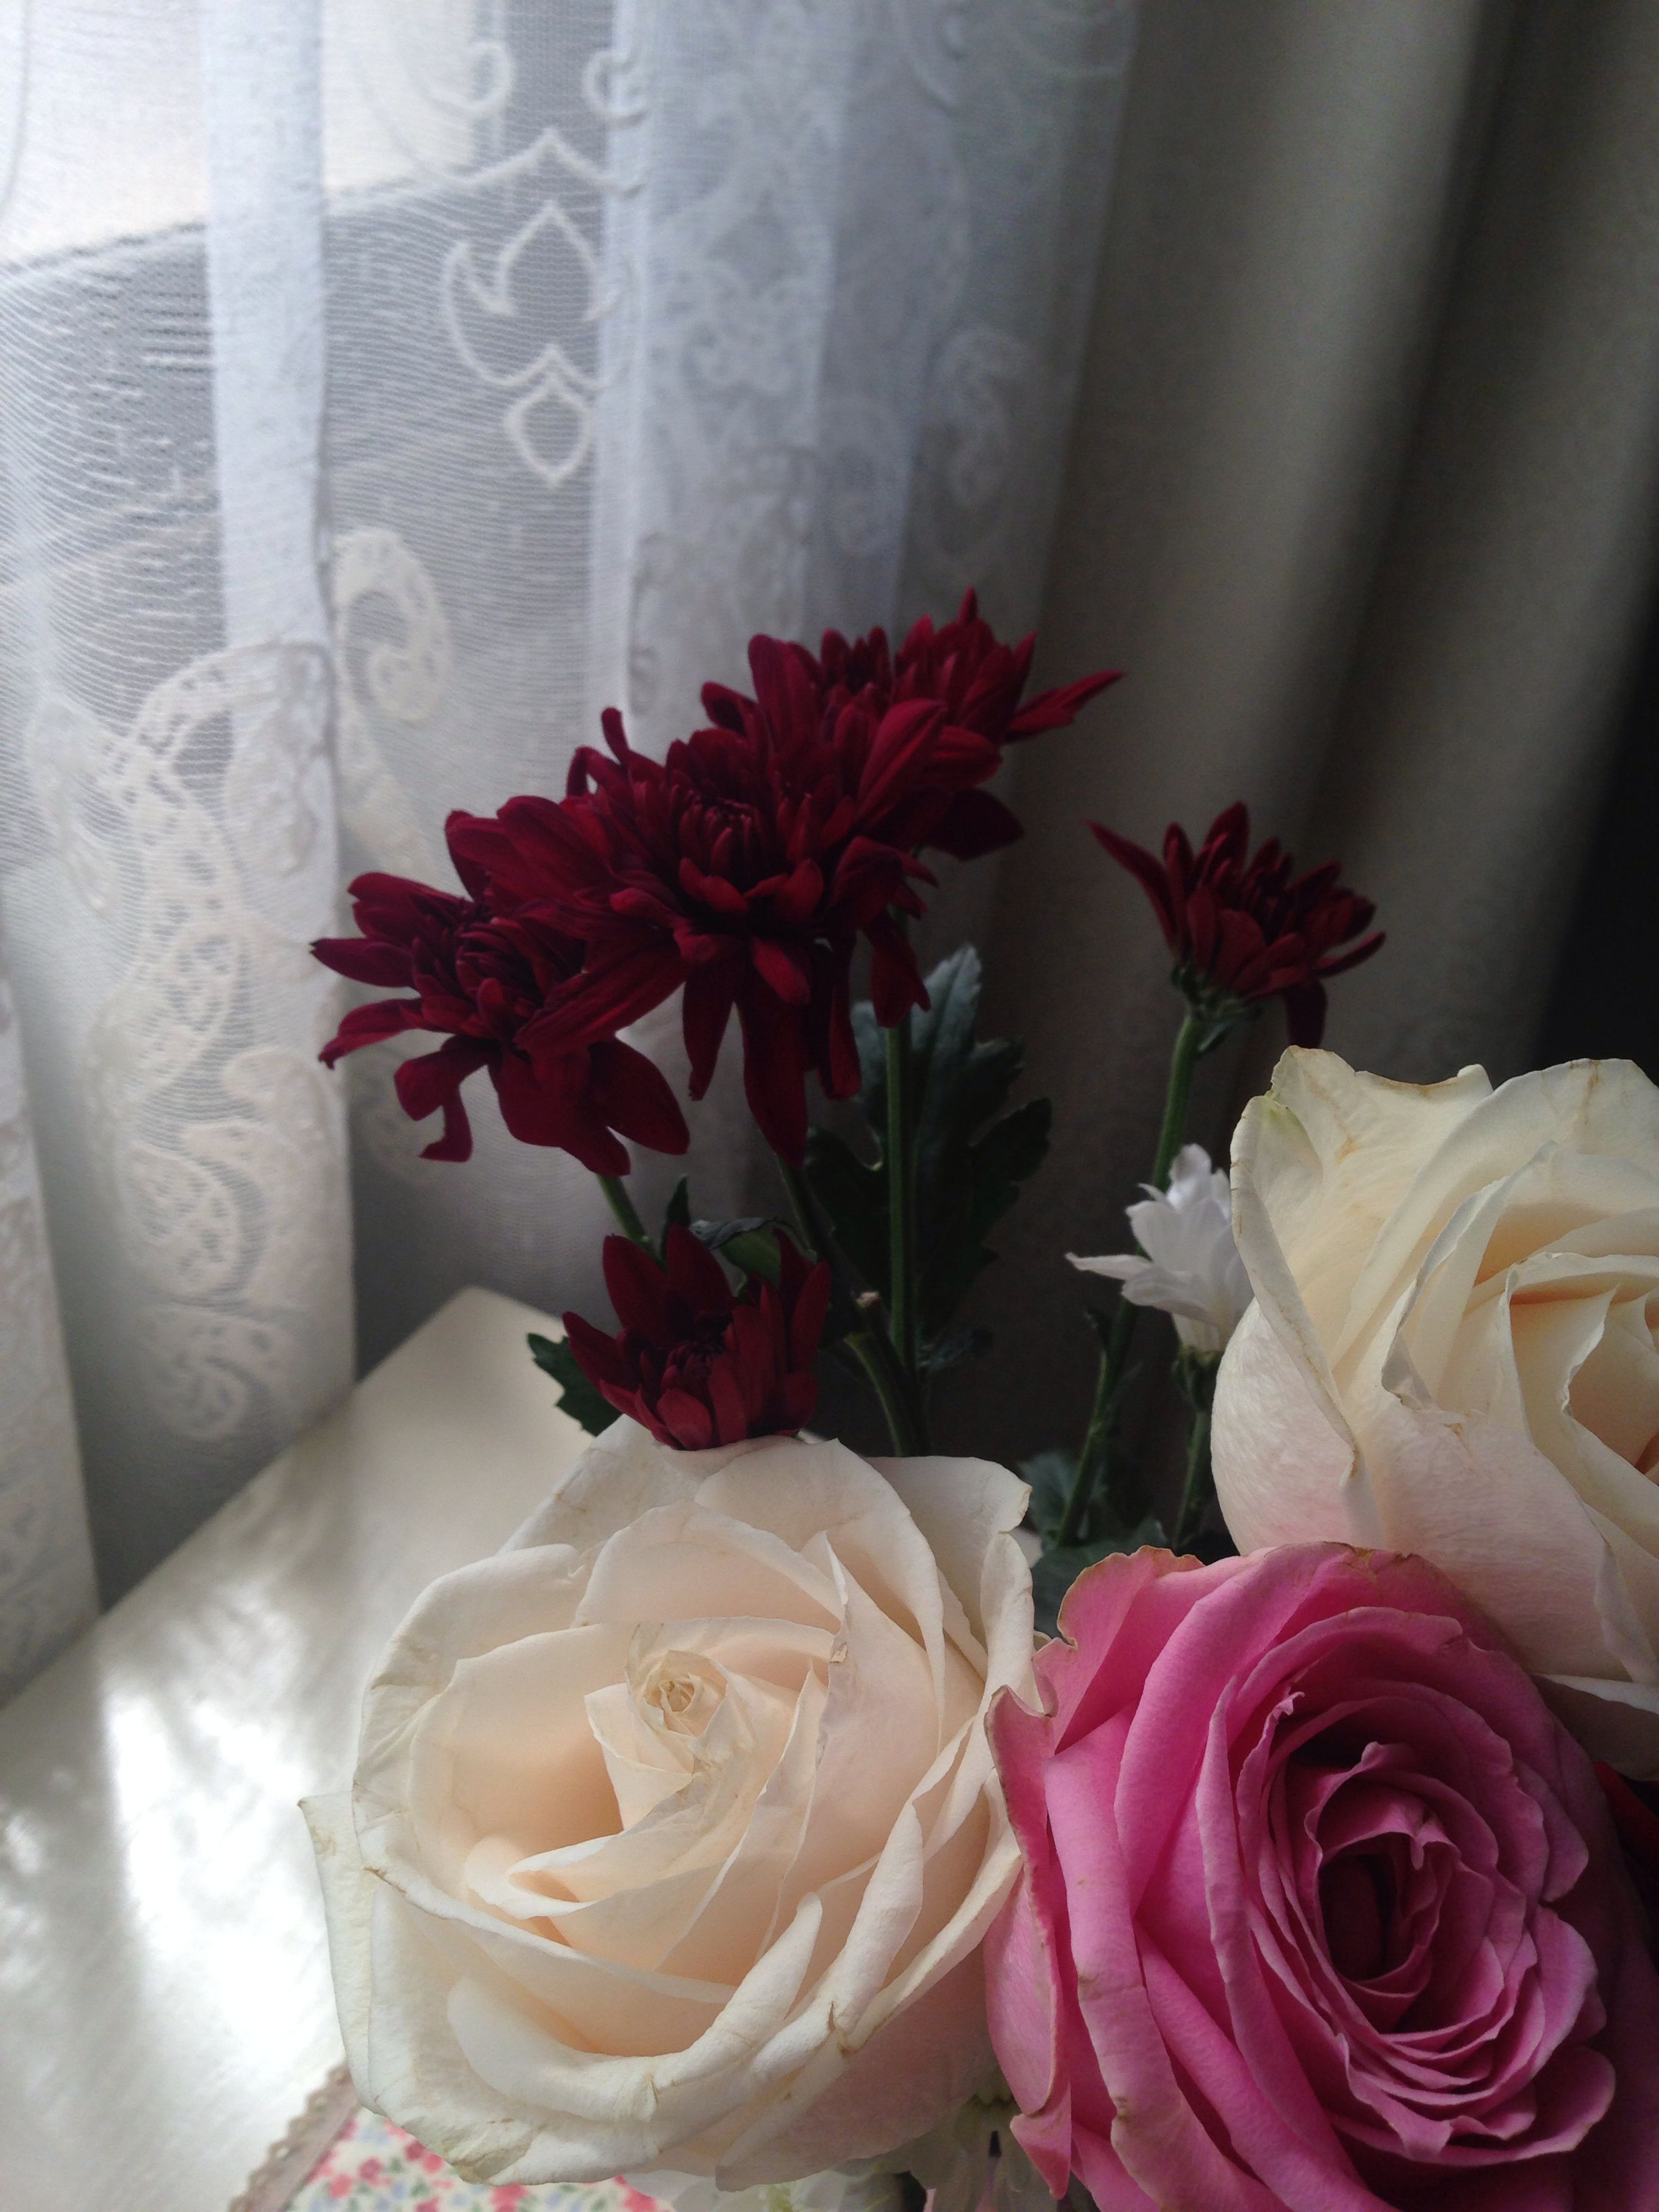 ورد الصباح Flowers Rose Plants